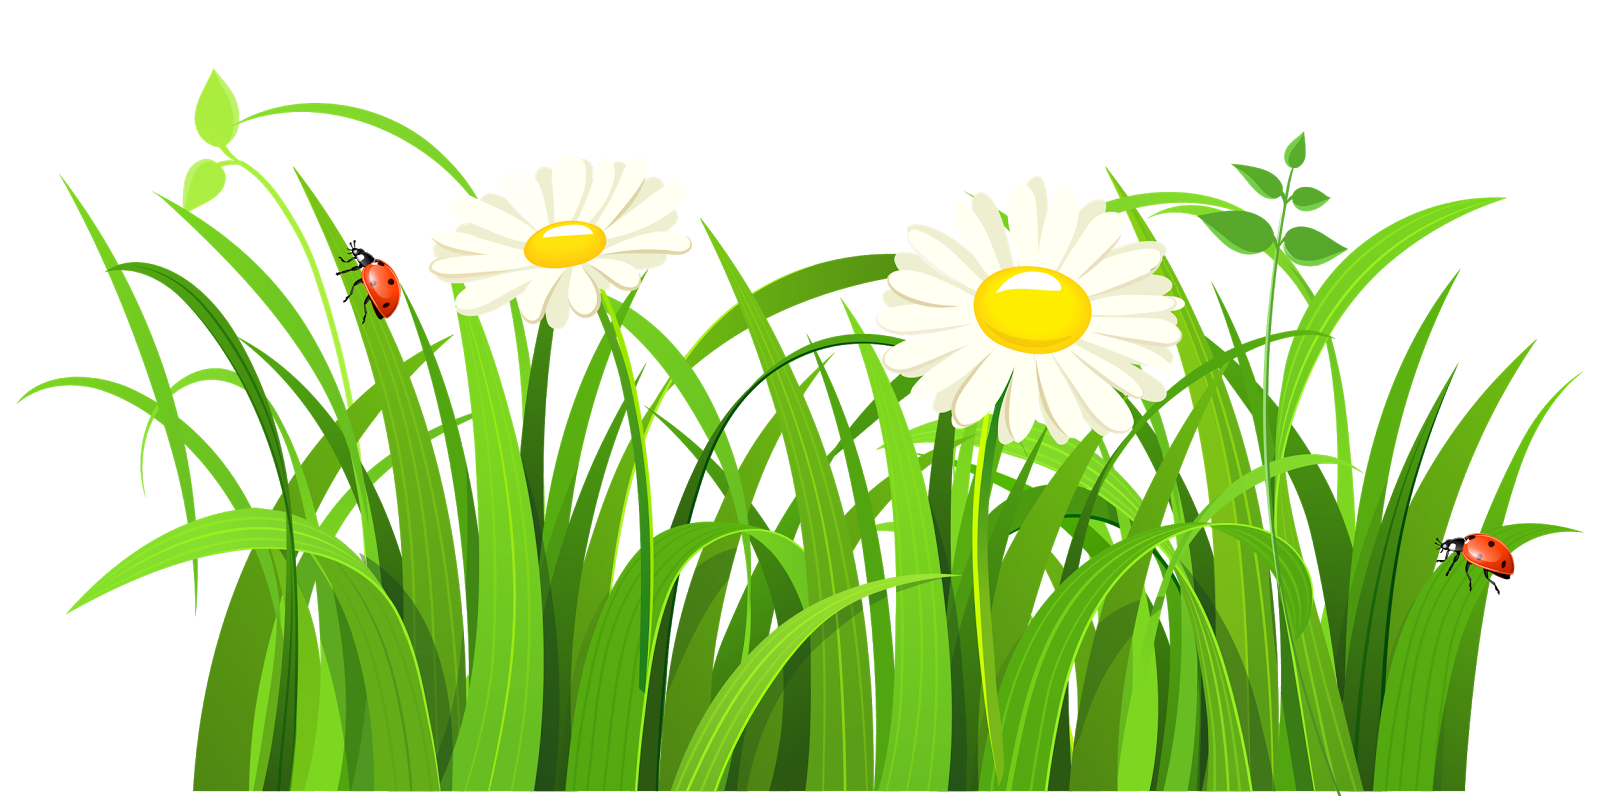 catatan liza label border bunga border flower bunga cantik clip art